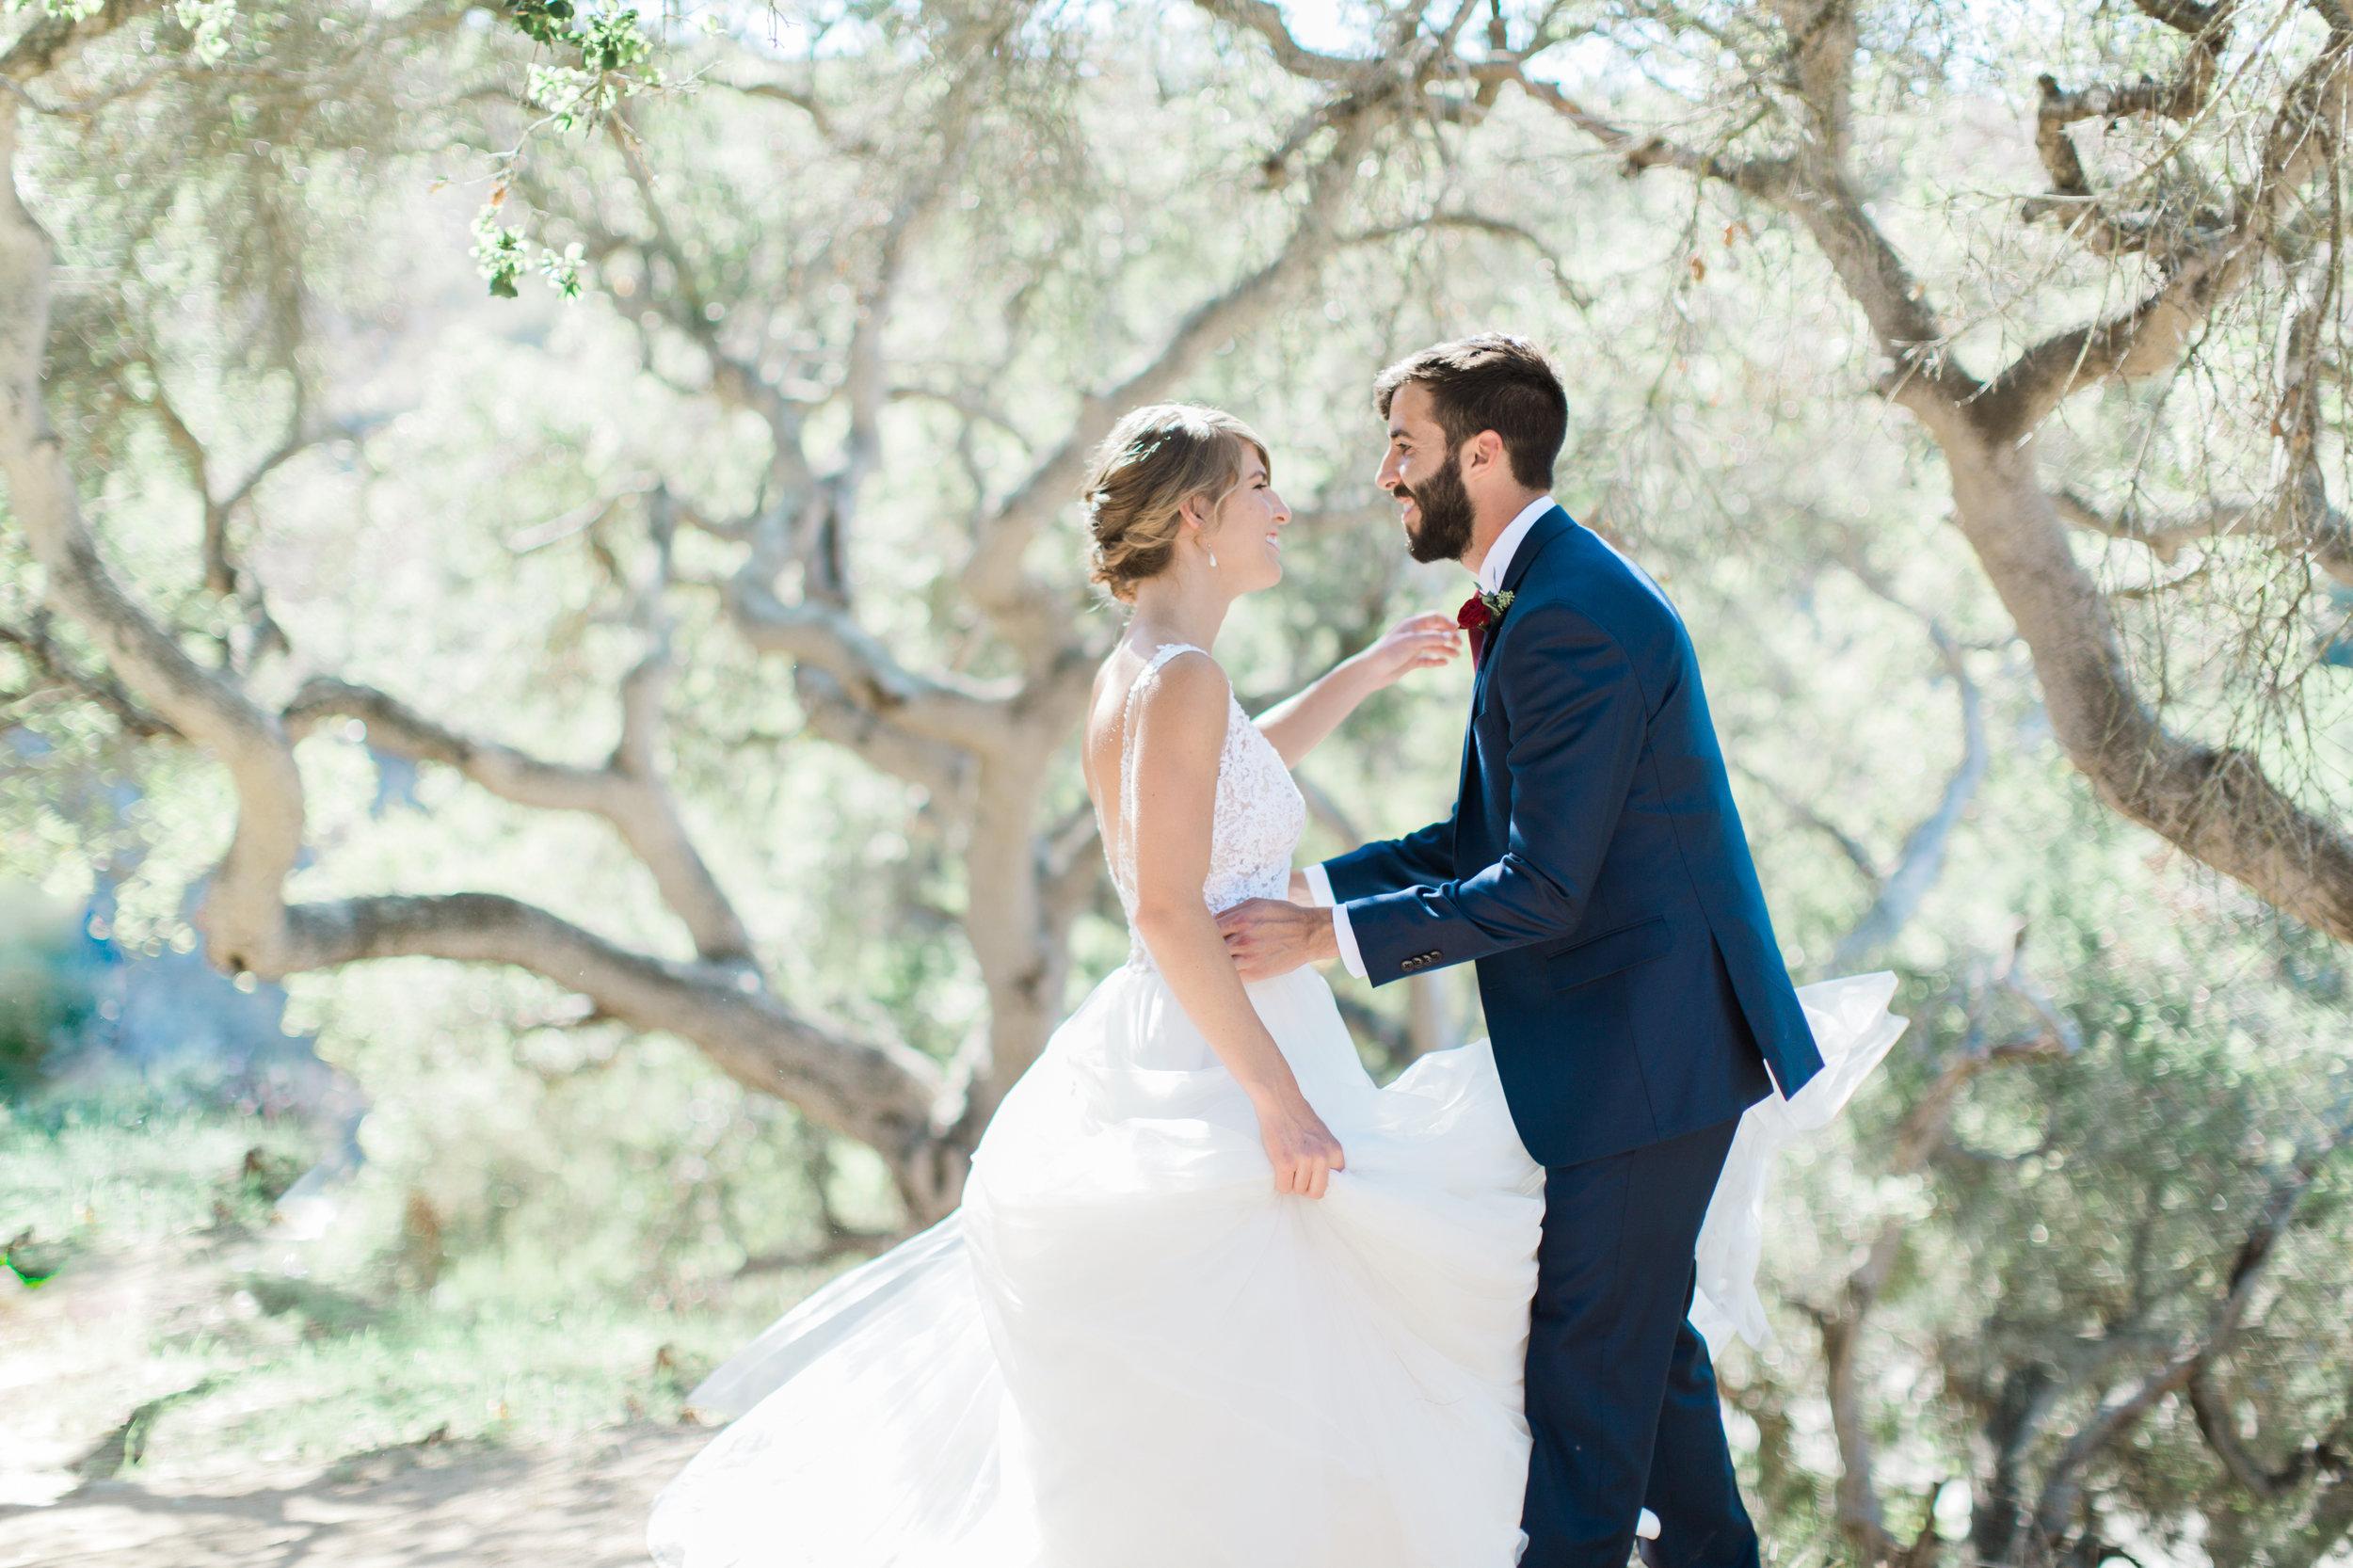 Elings Park Santa Barbara Wedding Photographer Leah Vis .jpg